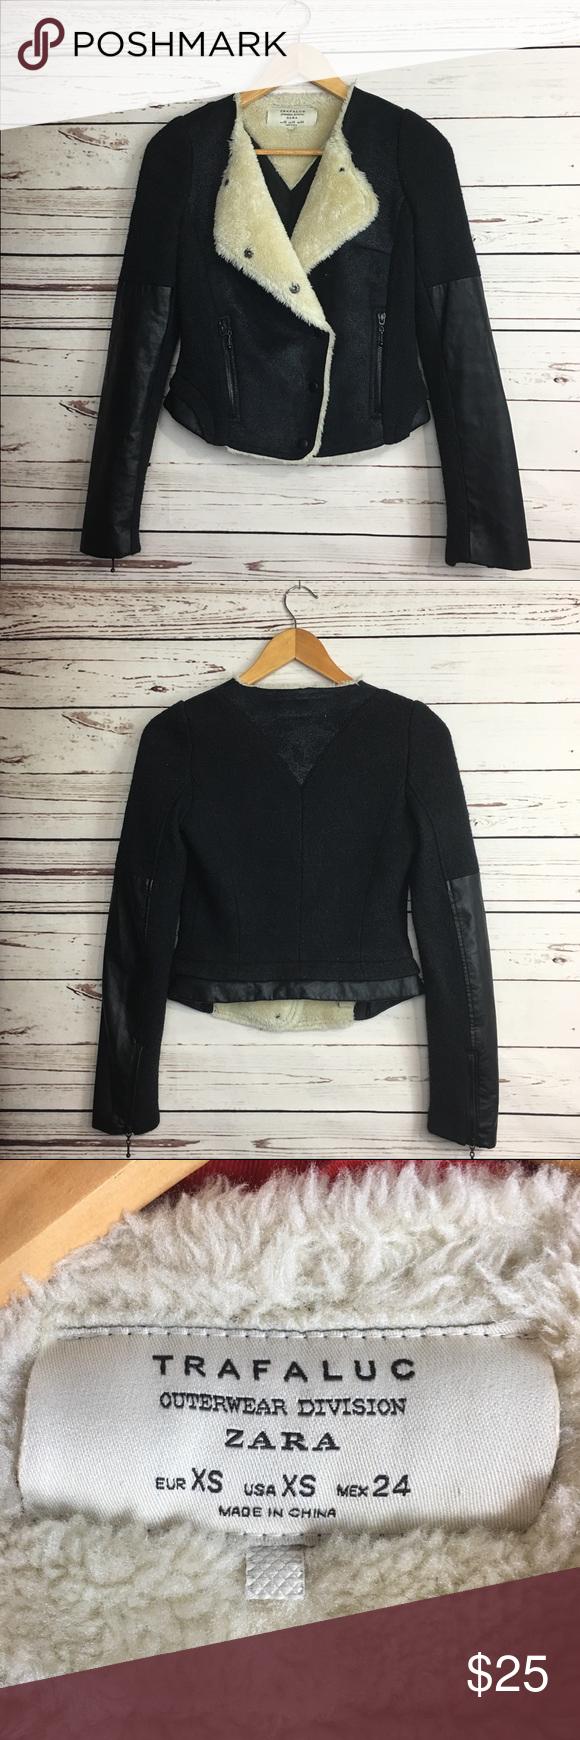 Zara Trafaluc Outerwear Division Jacket Wool Blend Outerwear Zara Zara Jackets [ 1740 x 580 Pixel ]